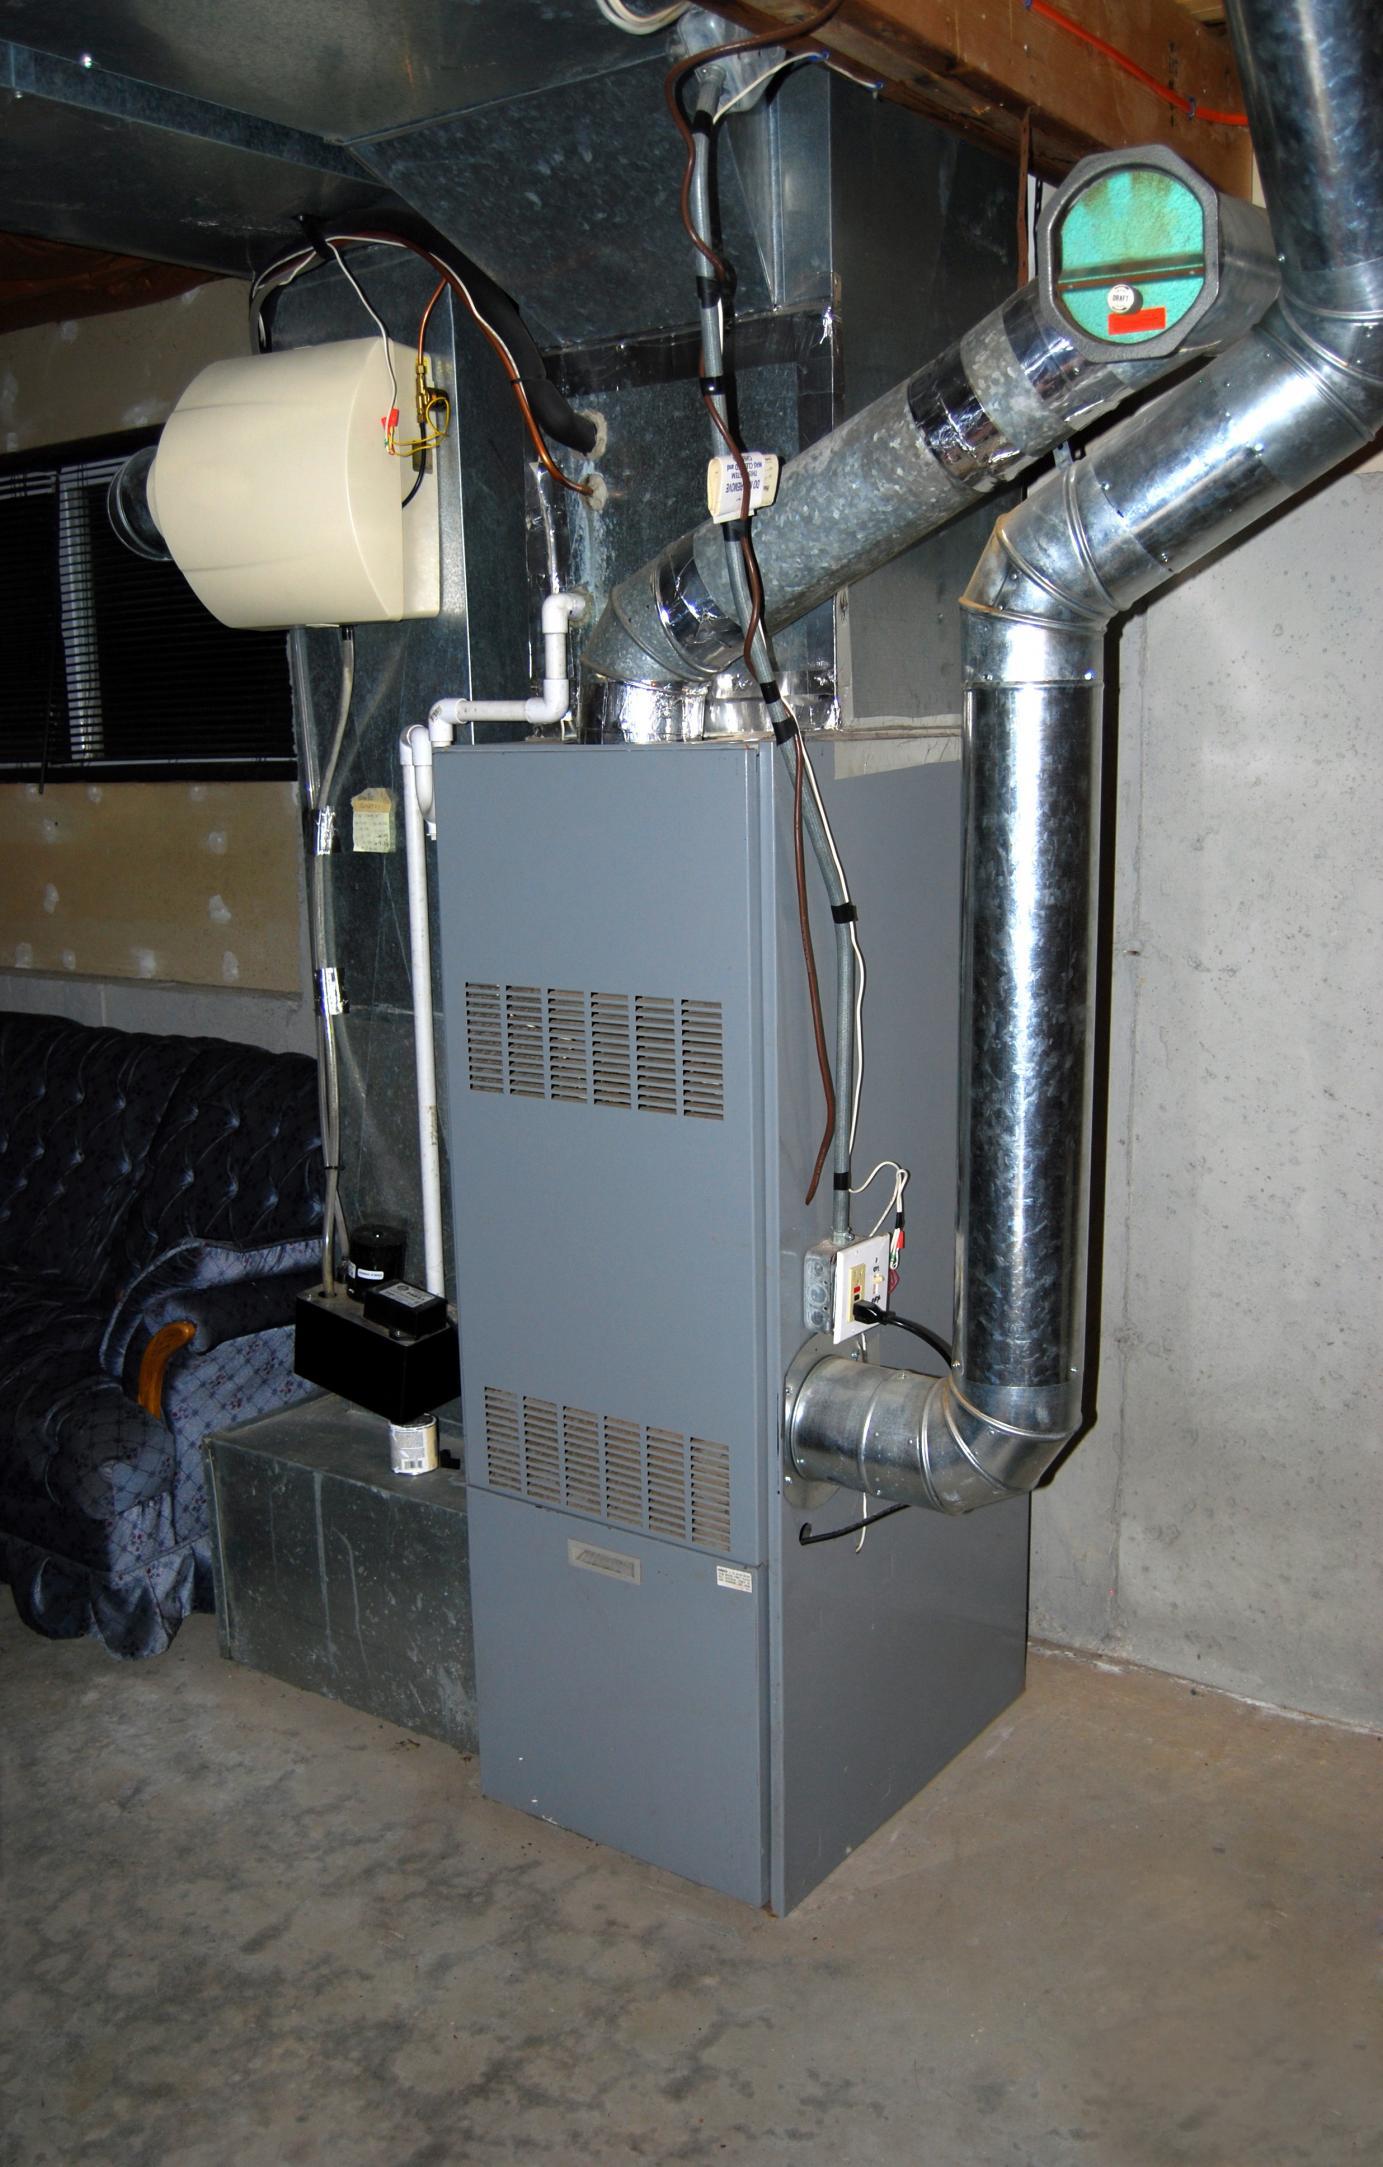 SouthEast Edmonton Plumbers - Home Page - Furnace repair Edmonton AB